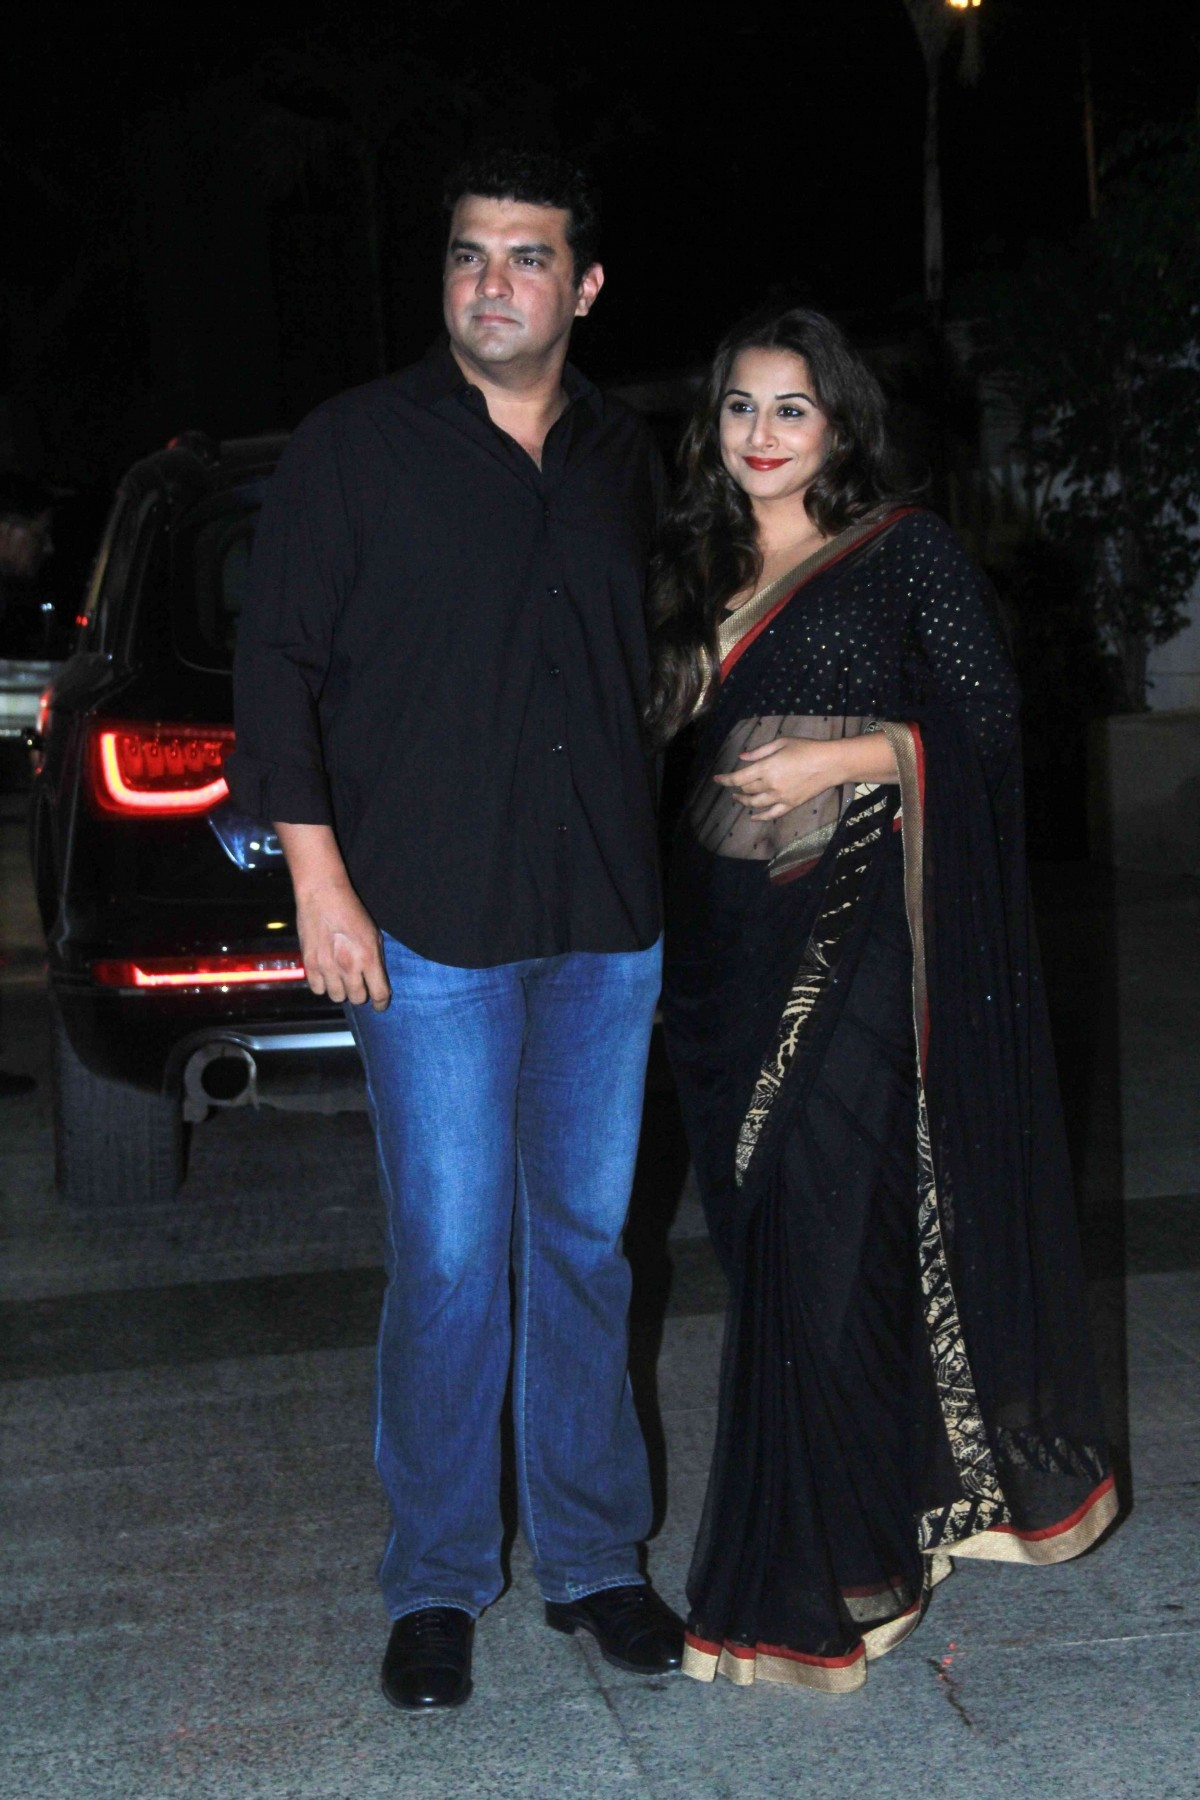 Priyanka Chopra, Kangana Ranaut Celebrate National Award Win